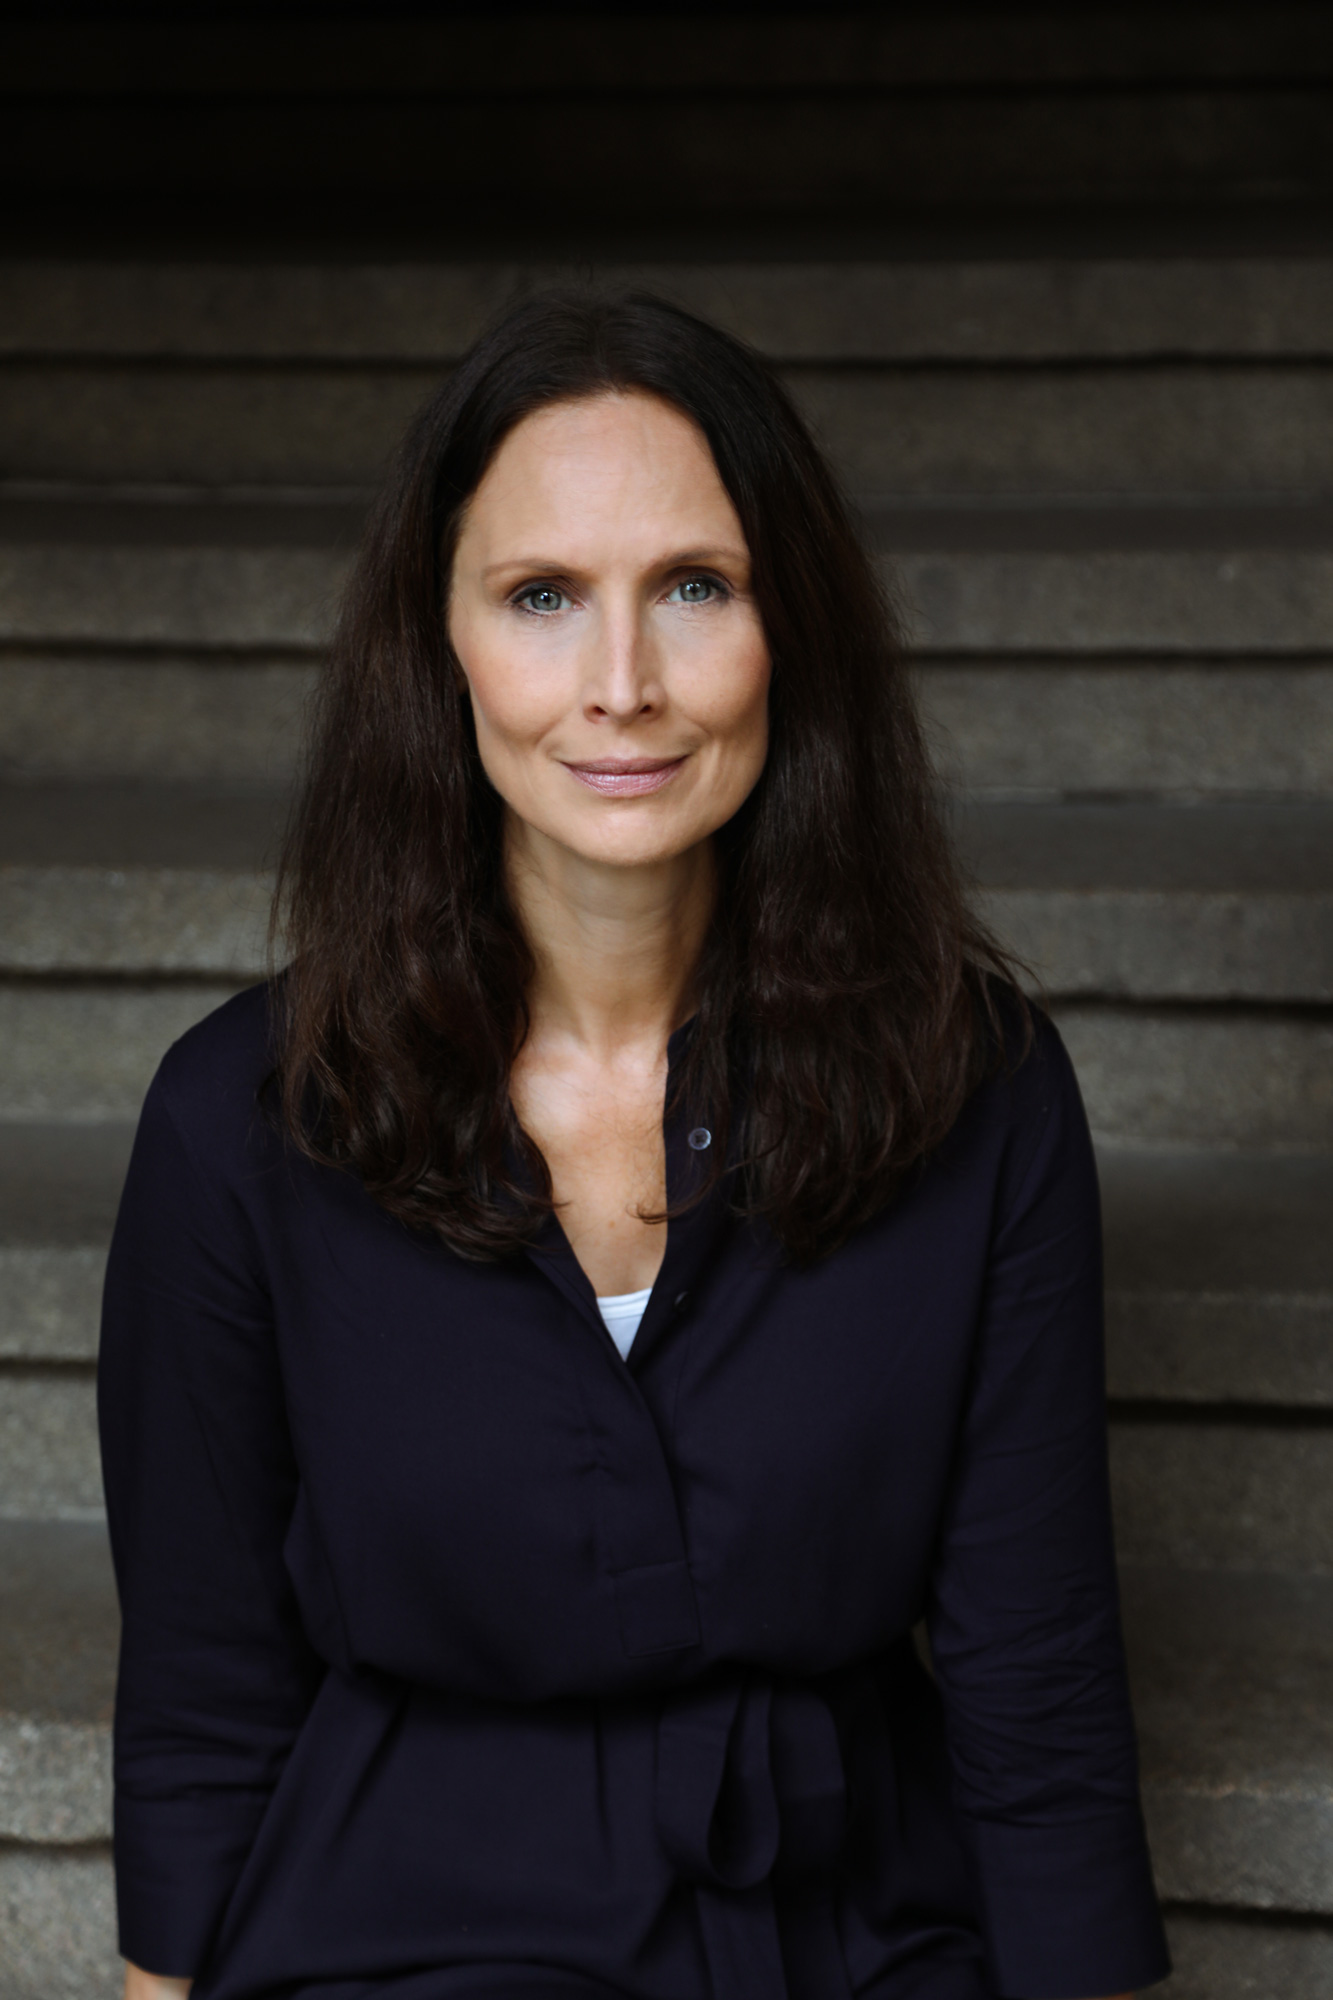 Heidi Jürgens